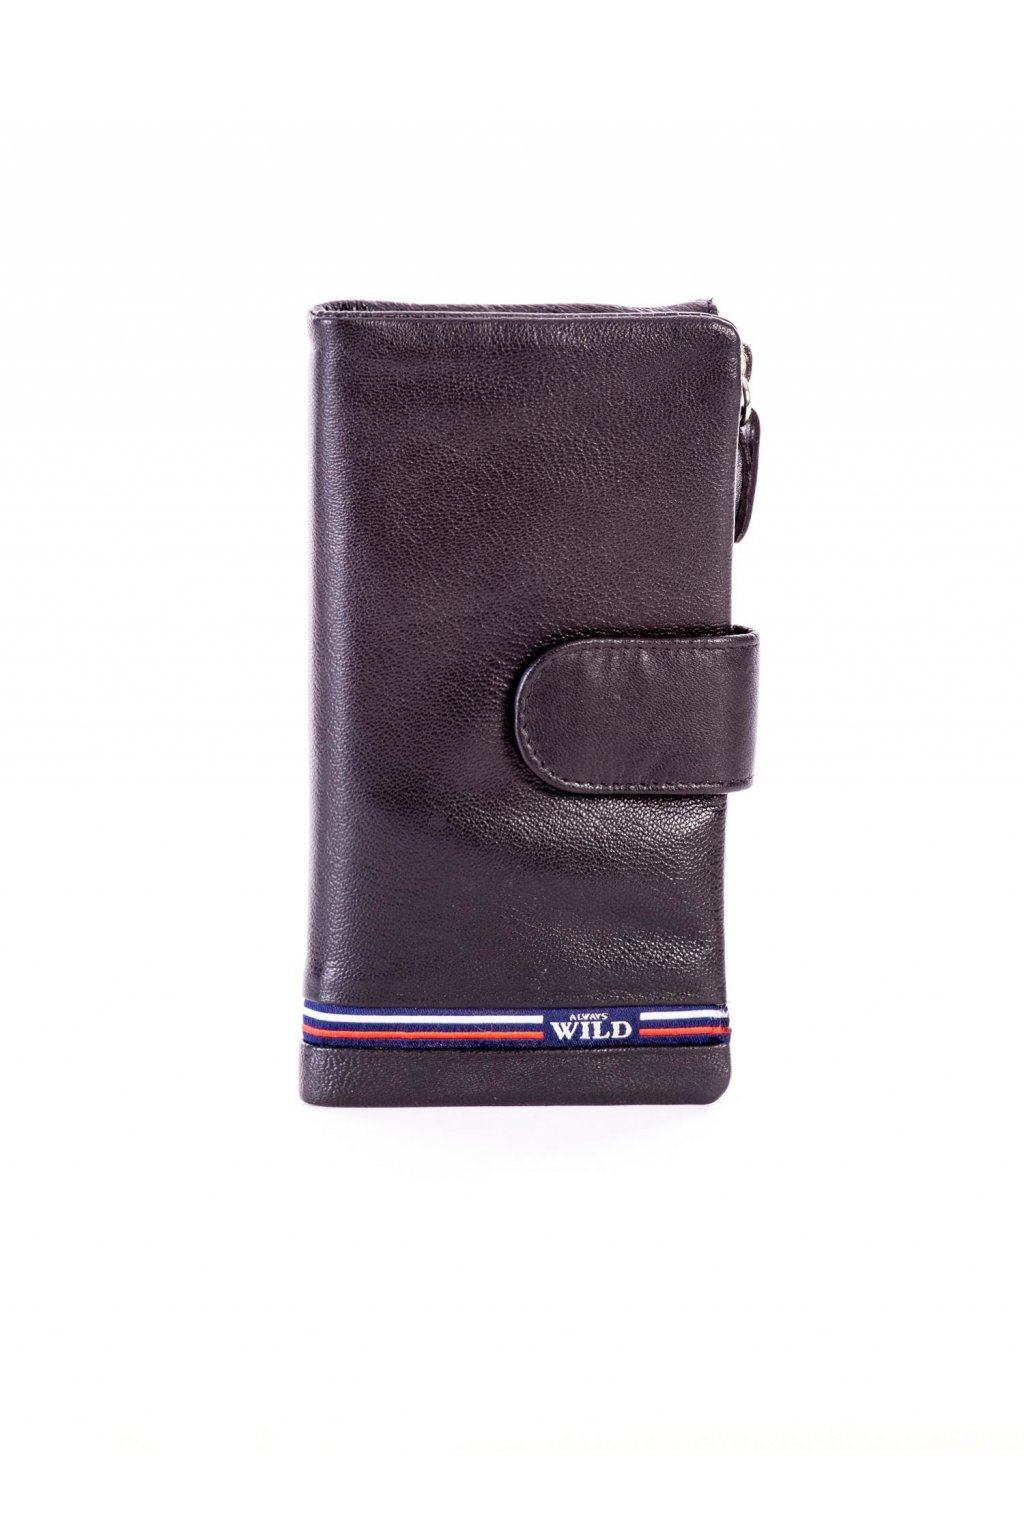 Peňaženka kód CE-PR-N502-GV.64